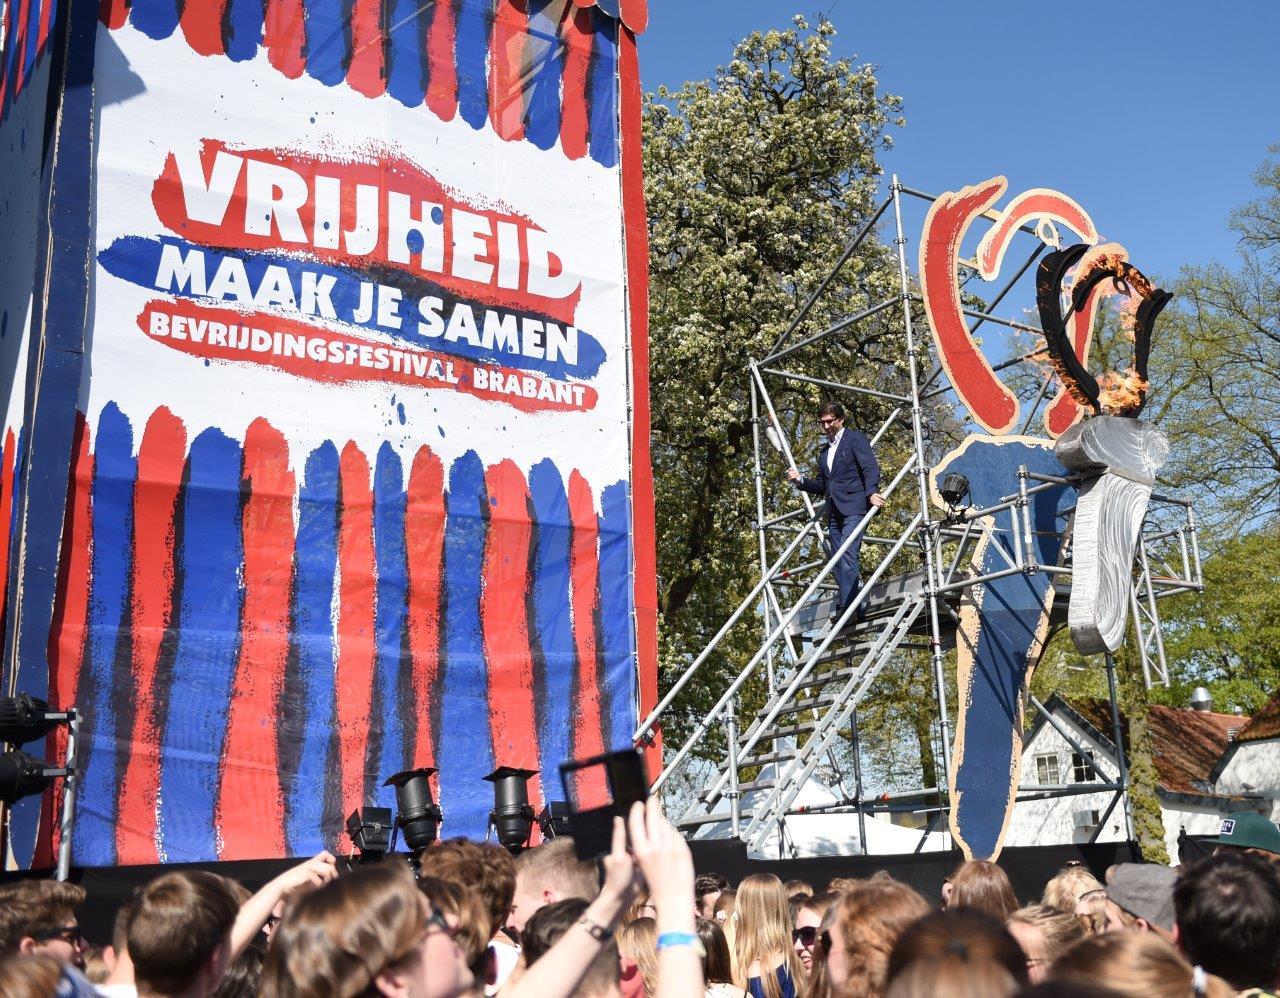 Bevrijdingsfestival-event